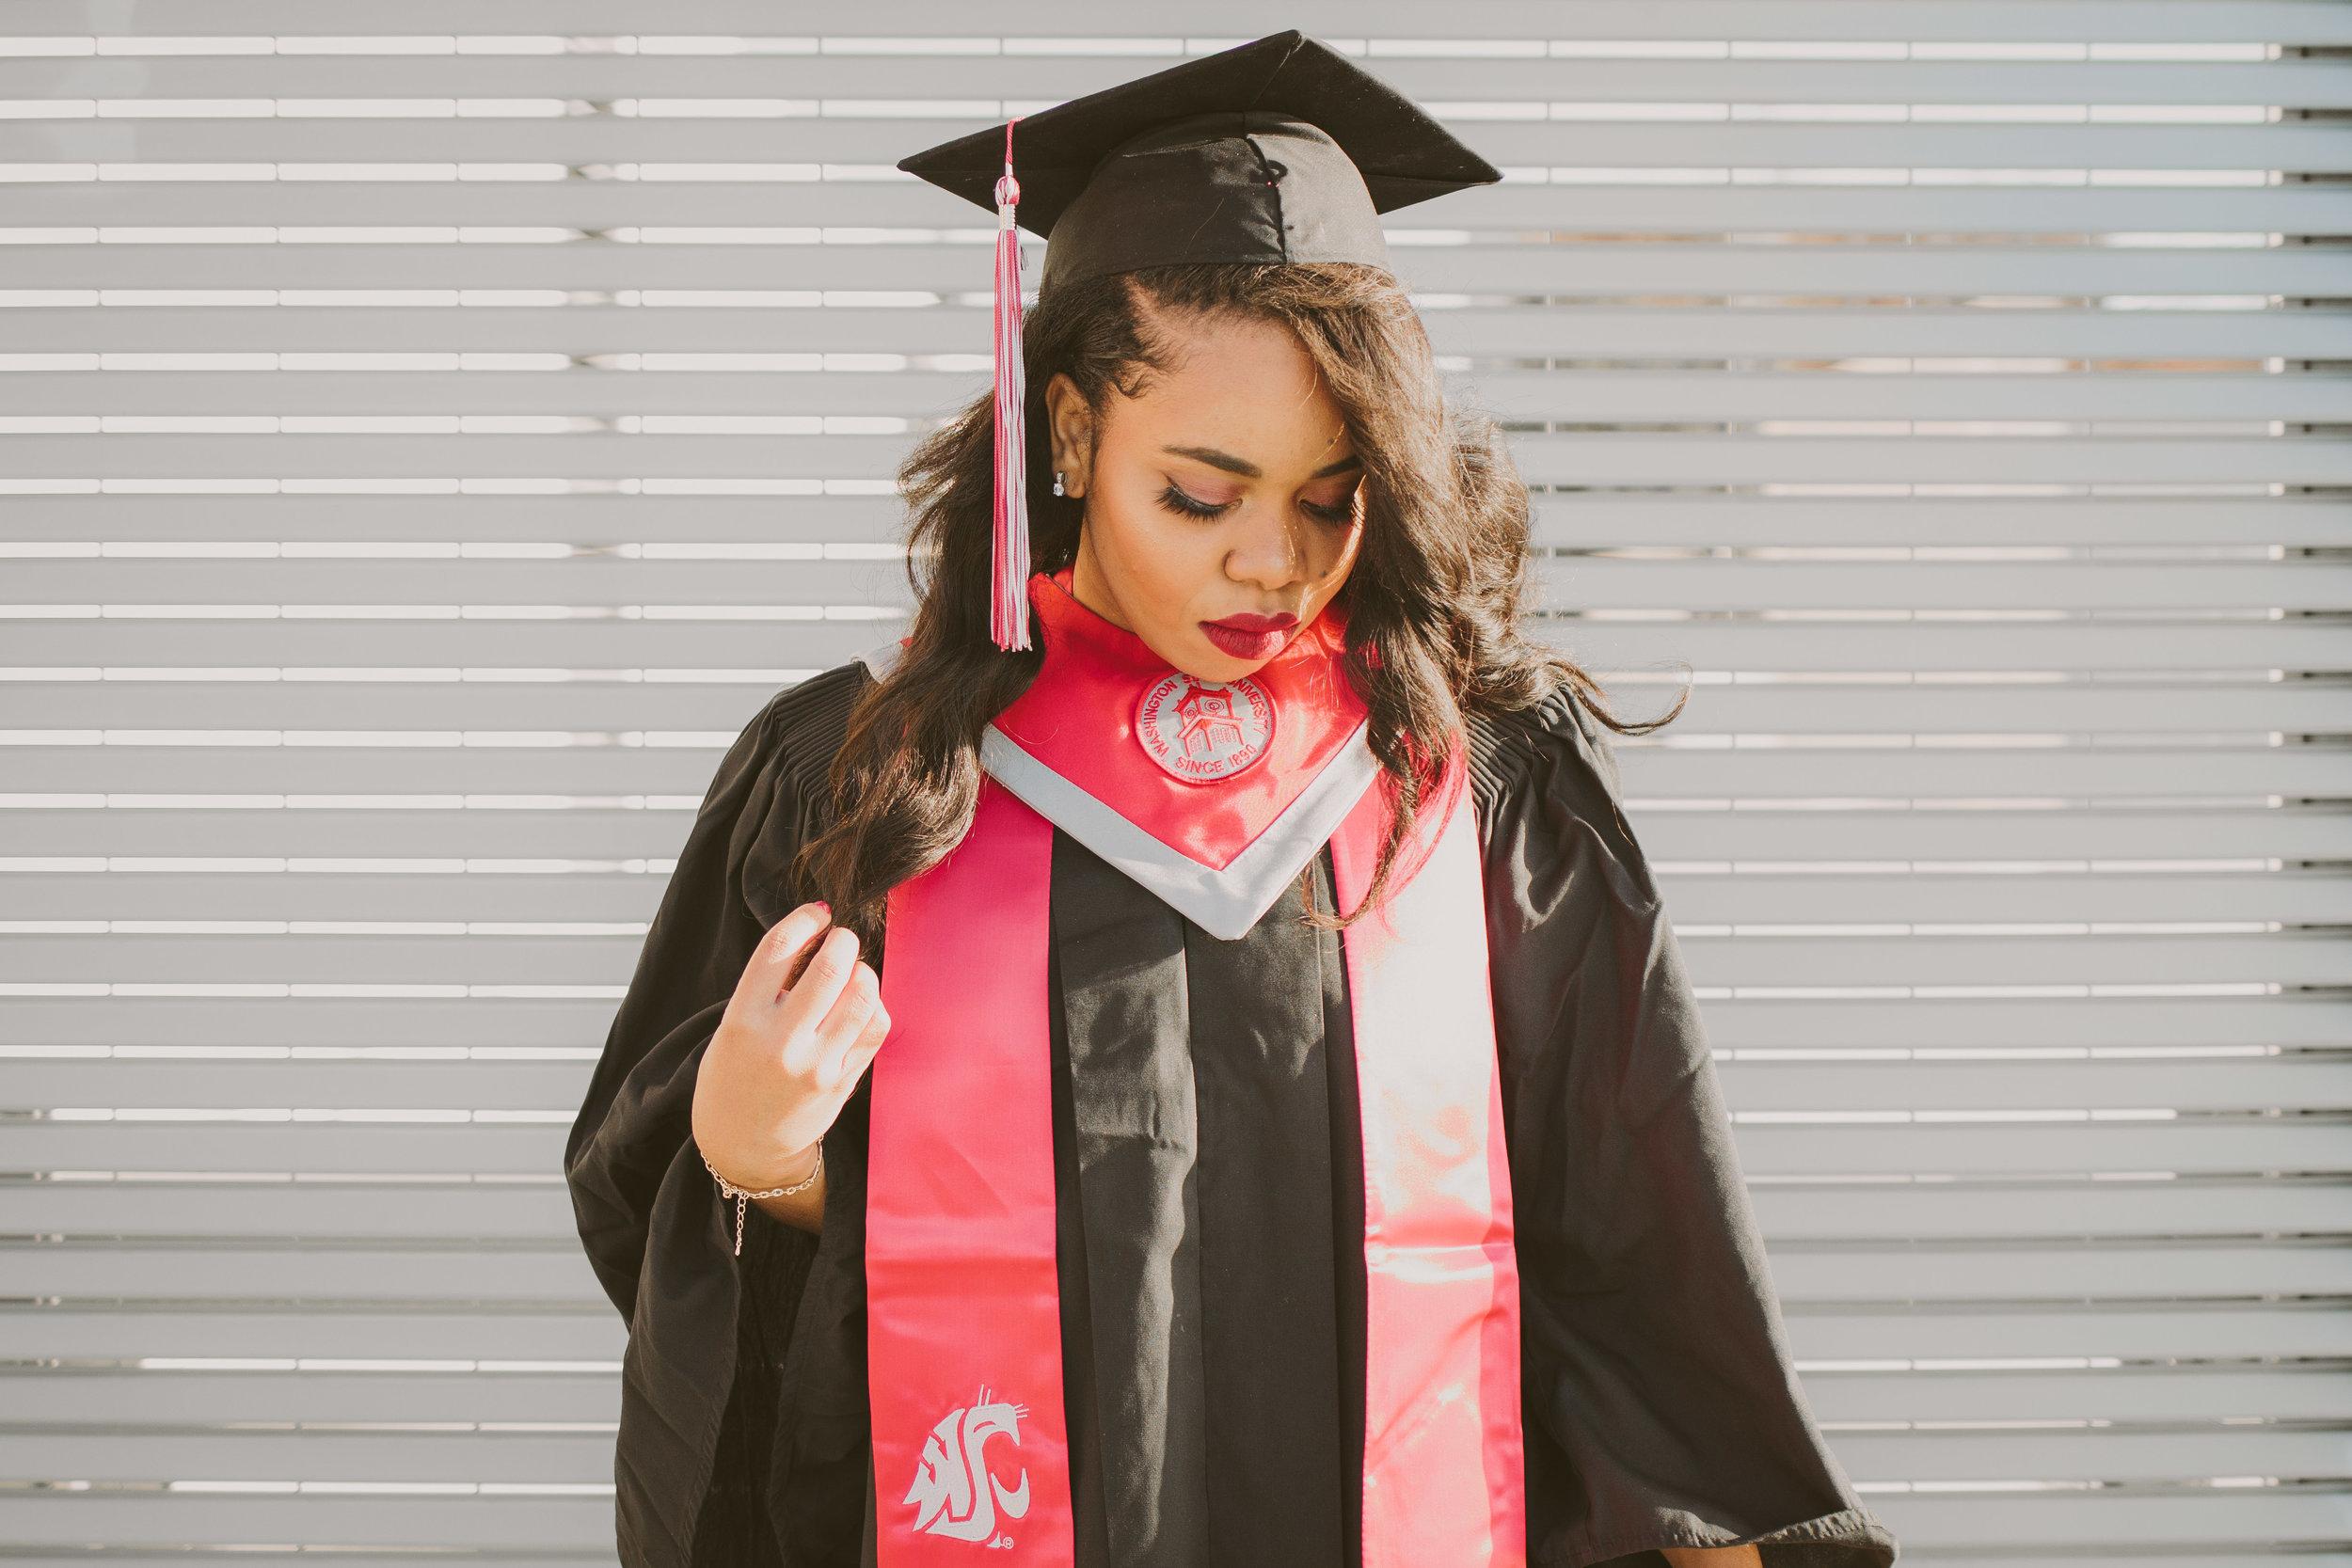 Ana_graduation-30.jpg